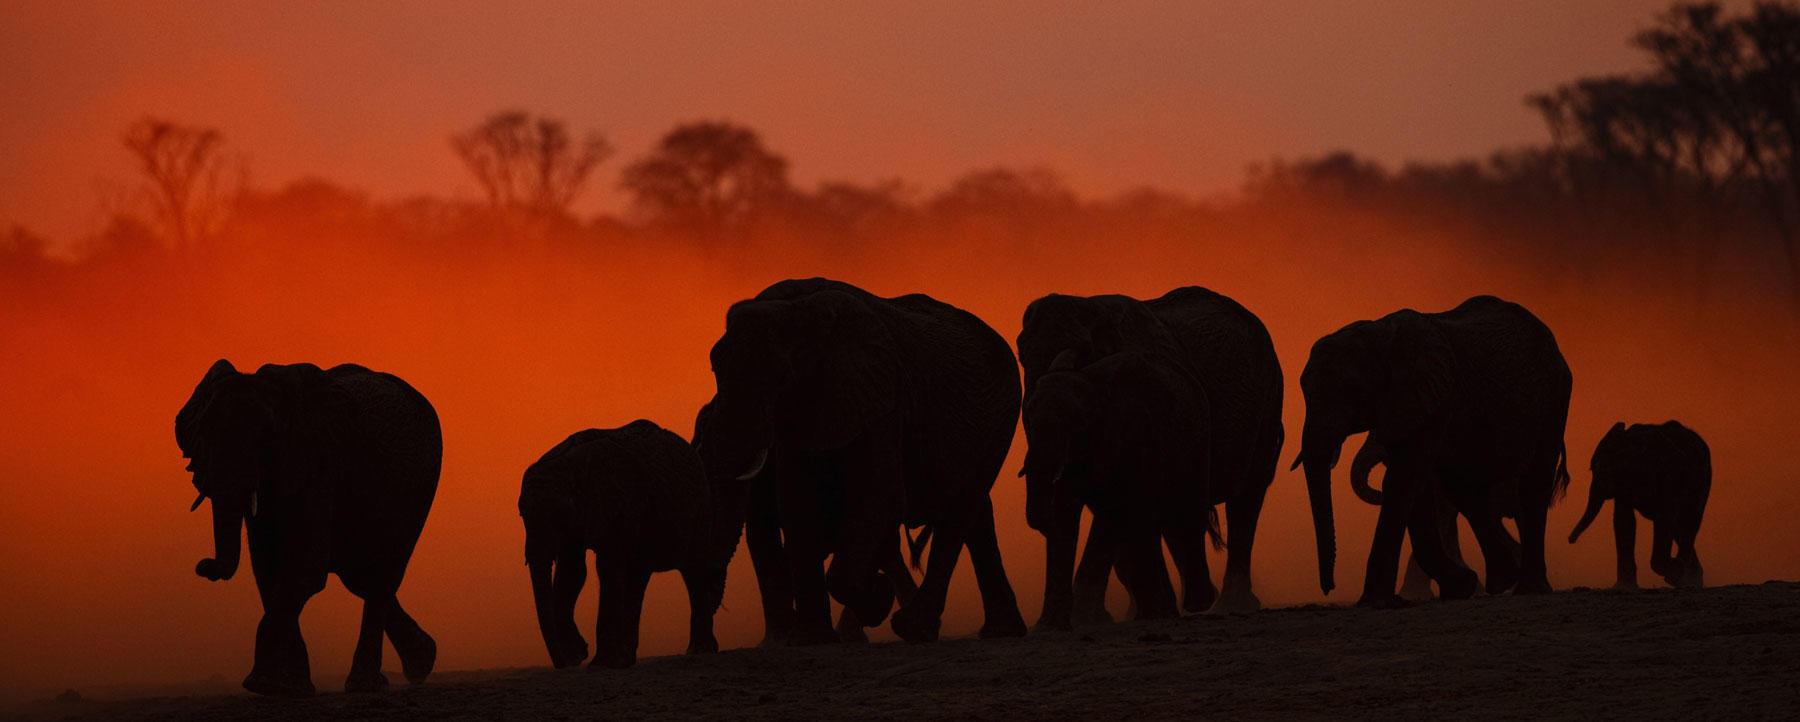 Silhouetted elephants in Hwange